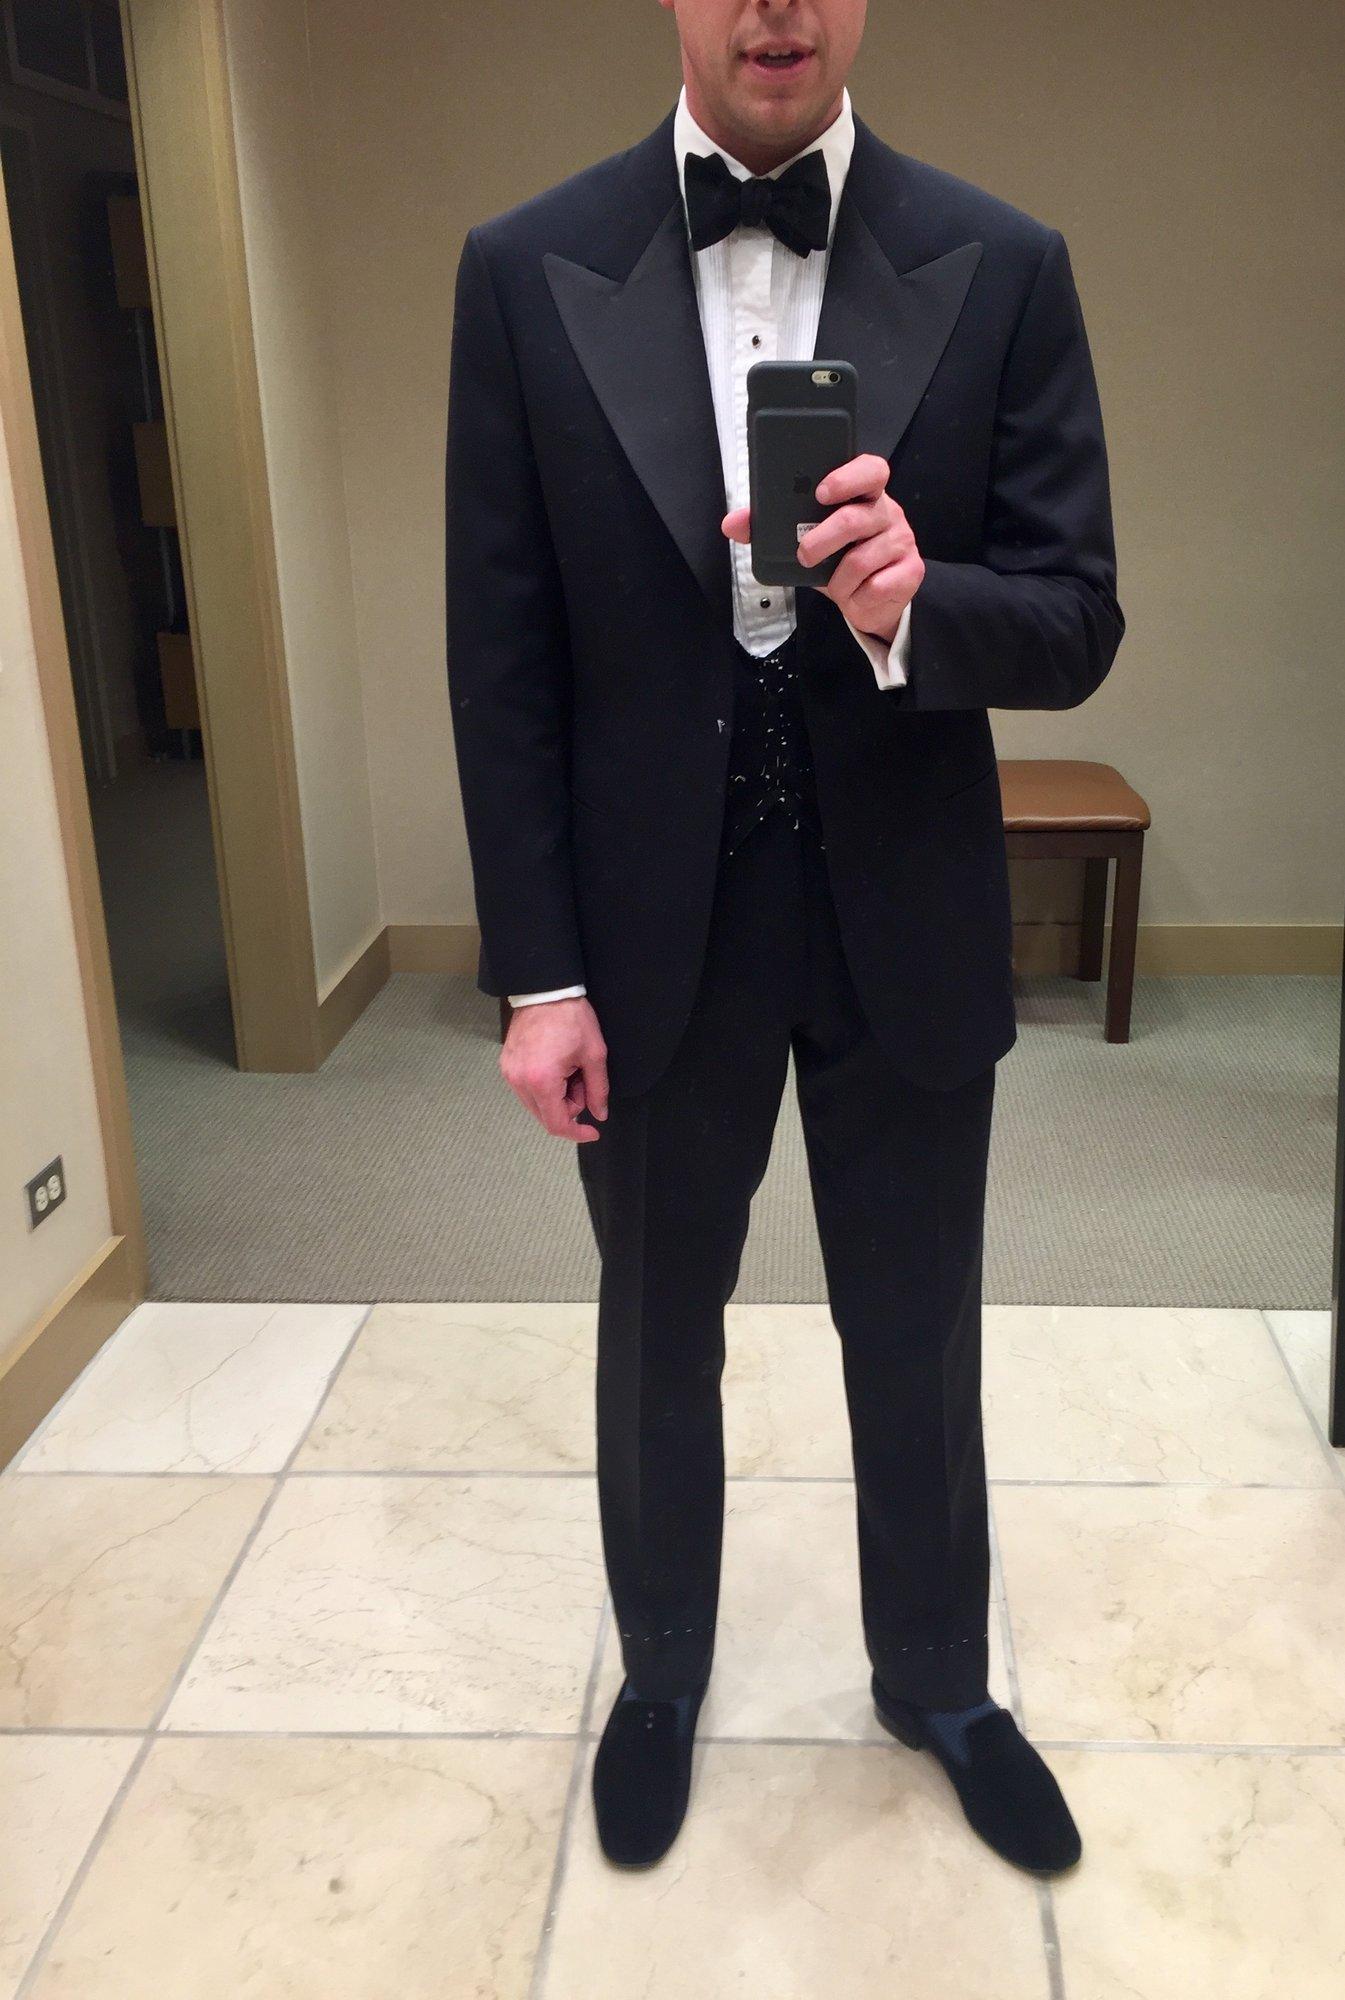 Black Silver stripes Square Cufflinks Formal Wear for Suit Shirt Wedding Dinner